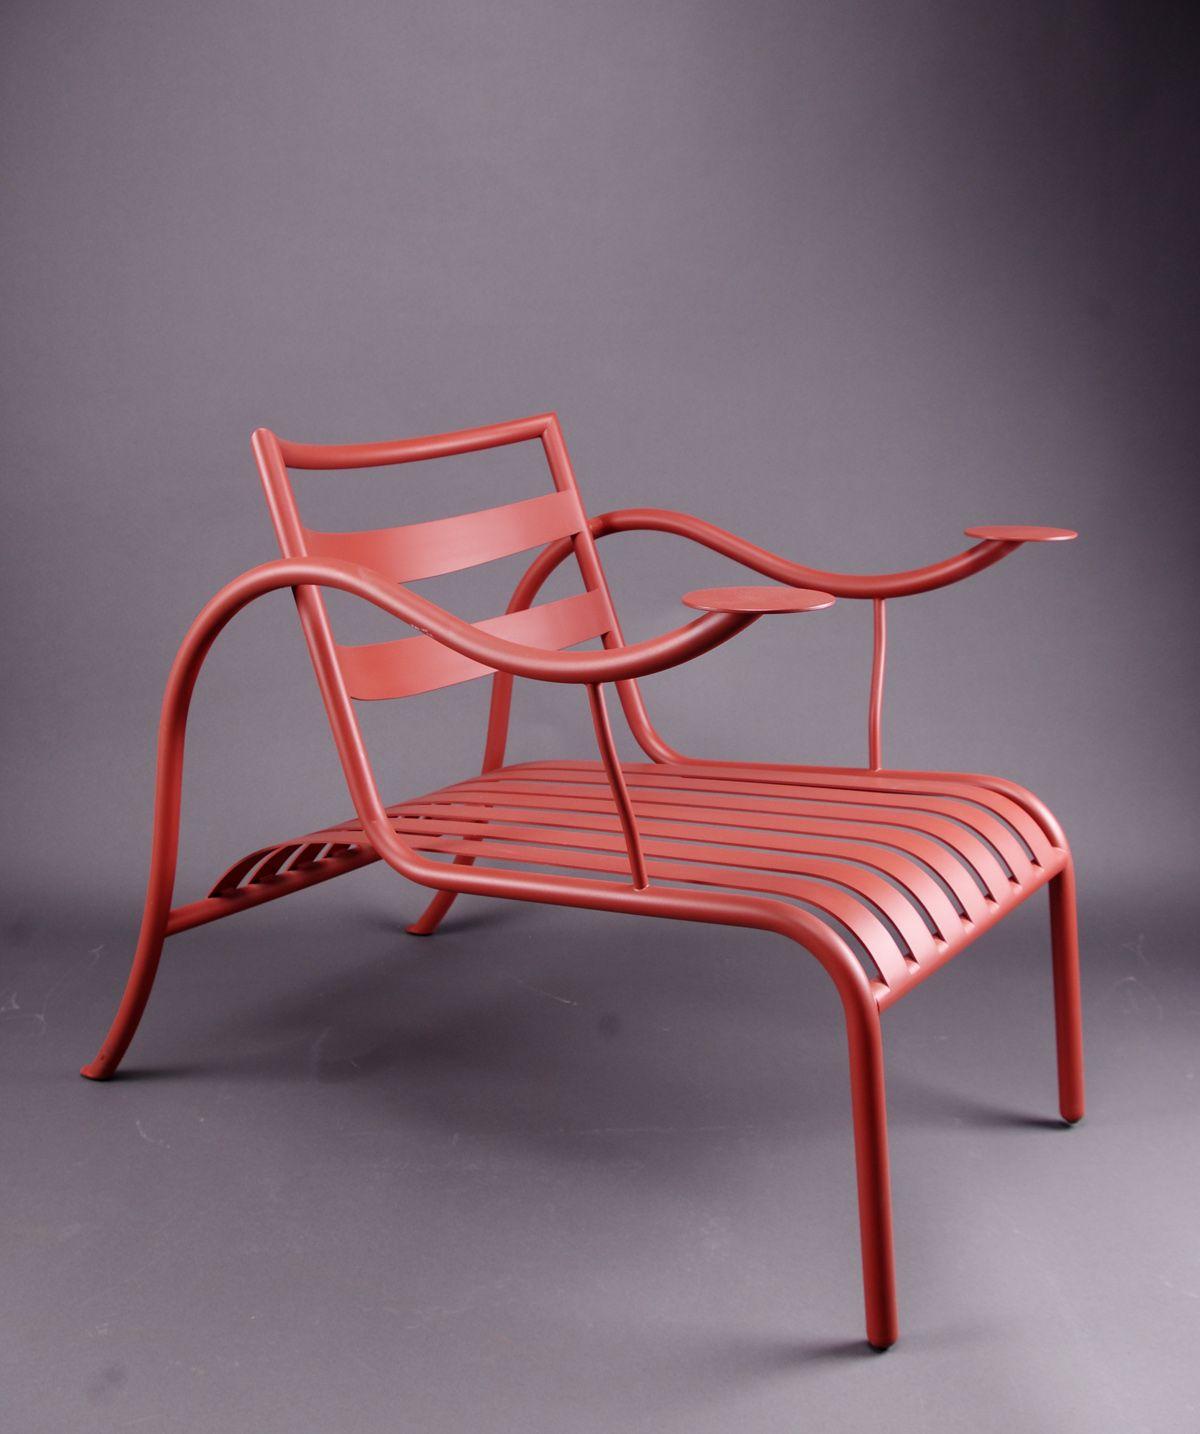 Jasper Morrison, Thinking Manu0027s Chair, 1986, Cappellini